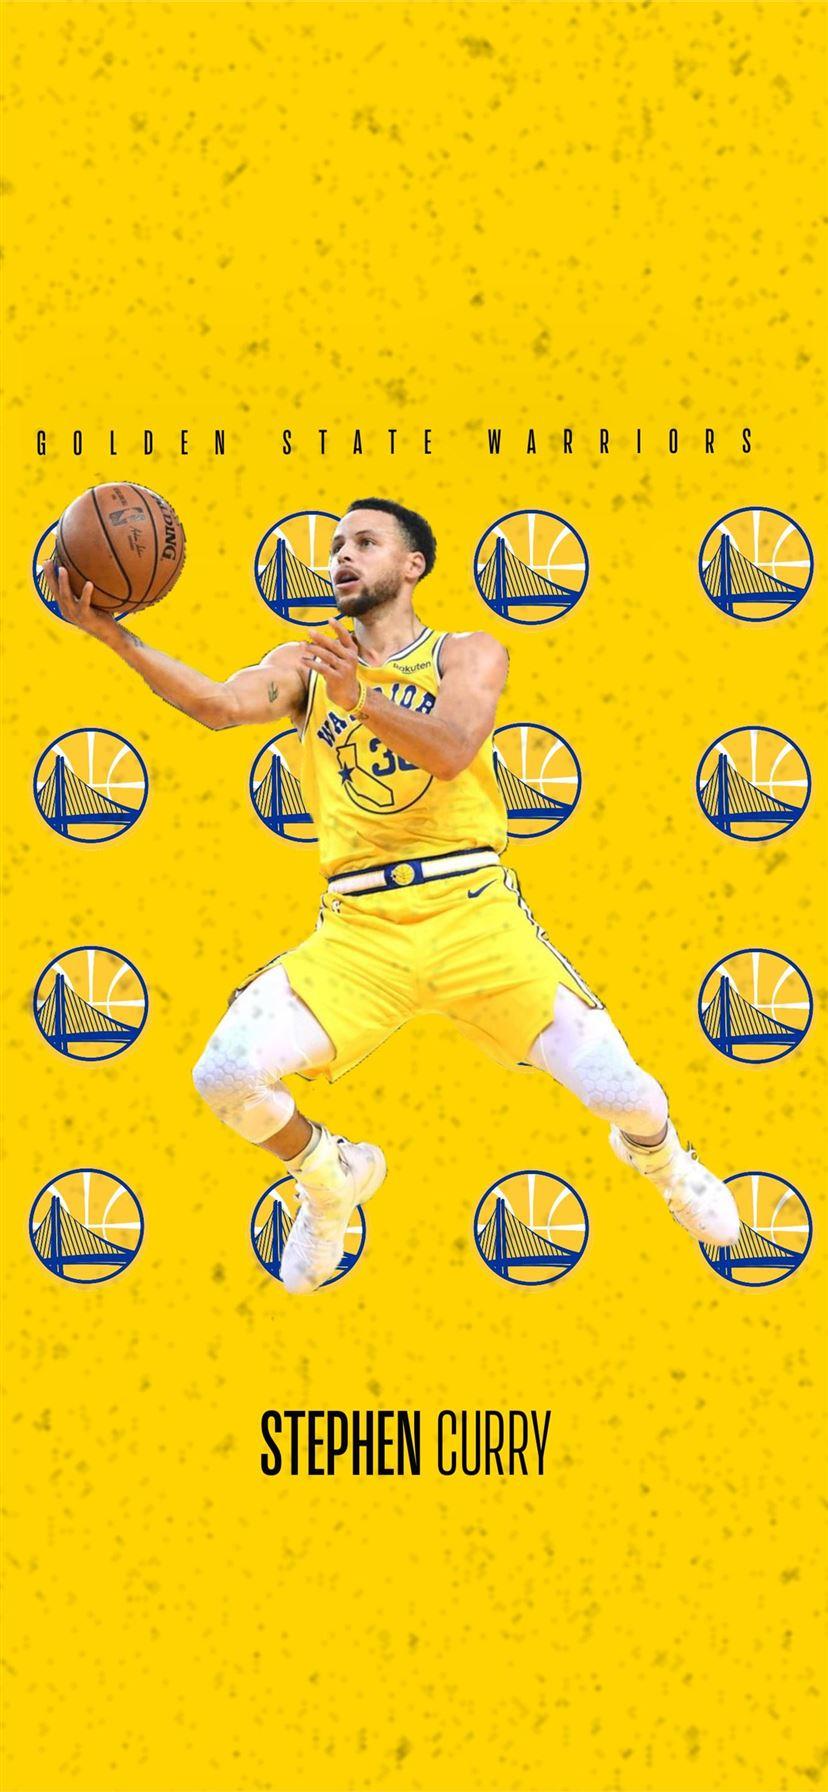 Best Stephen Curry Iphone 11 Wallpapers Hd 2020 Ilikewallpaper